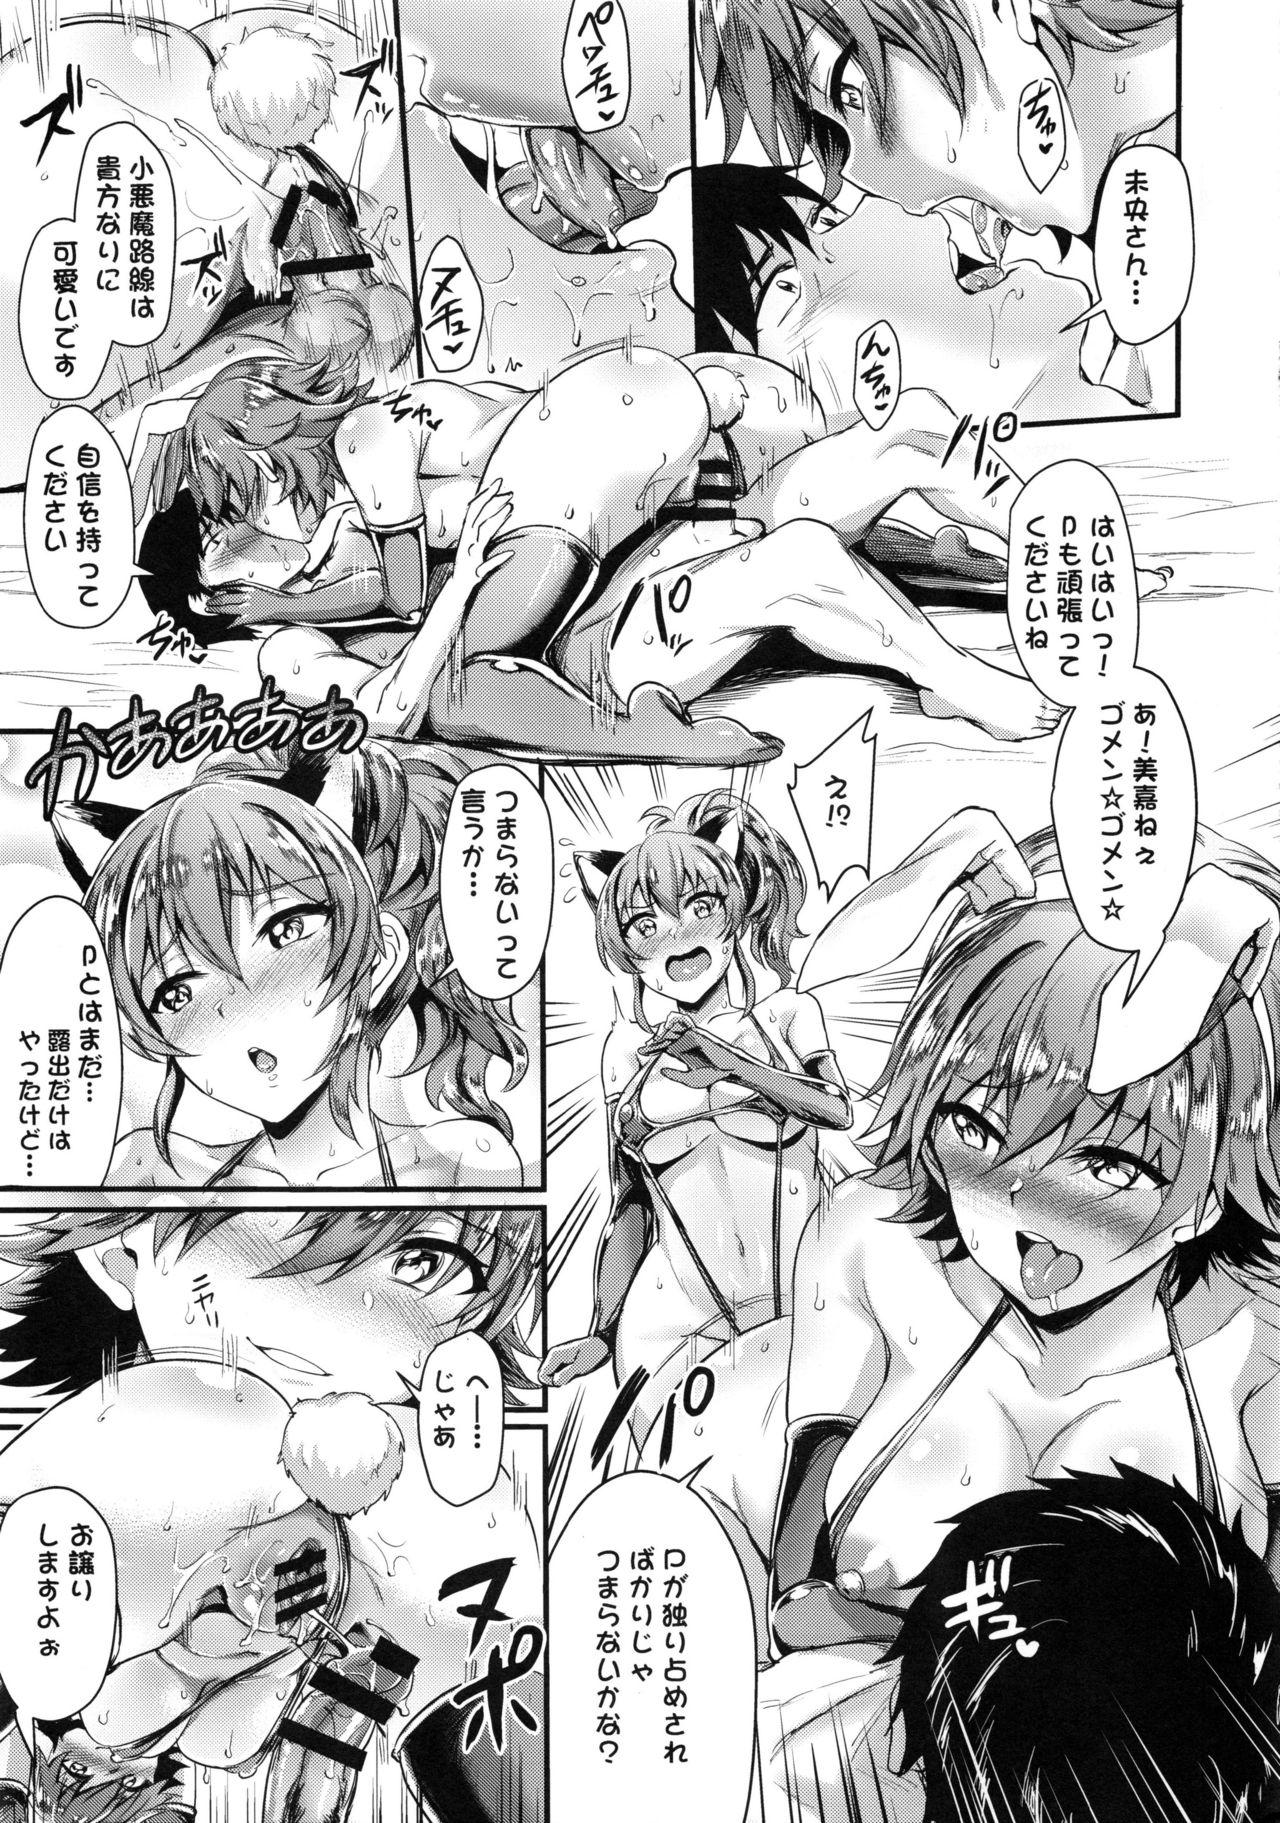 (C92) [BRIO (Puyocha)] Mika-nee no Tanryoku Shidou - Mika's Guide to Self-Confidence (THE IDOLM@STER CINDERELLA GIRLS) 15